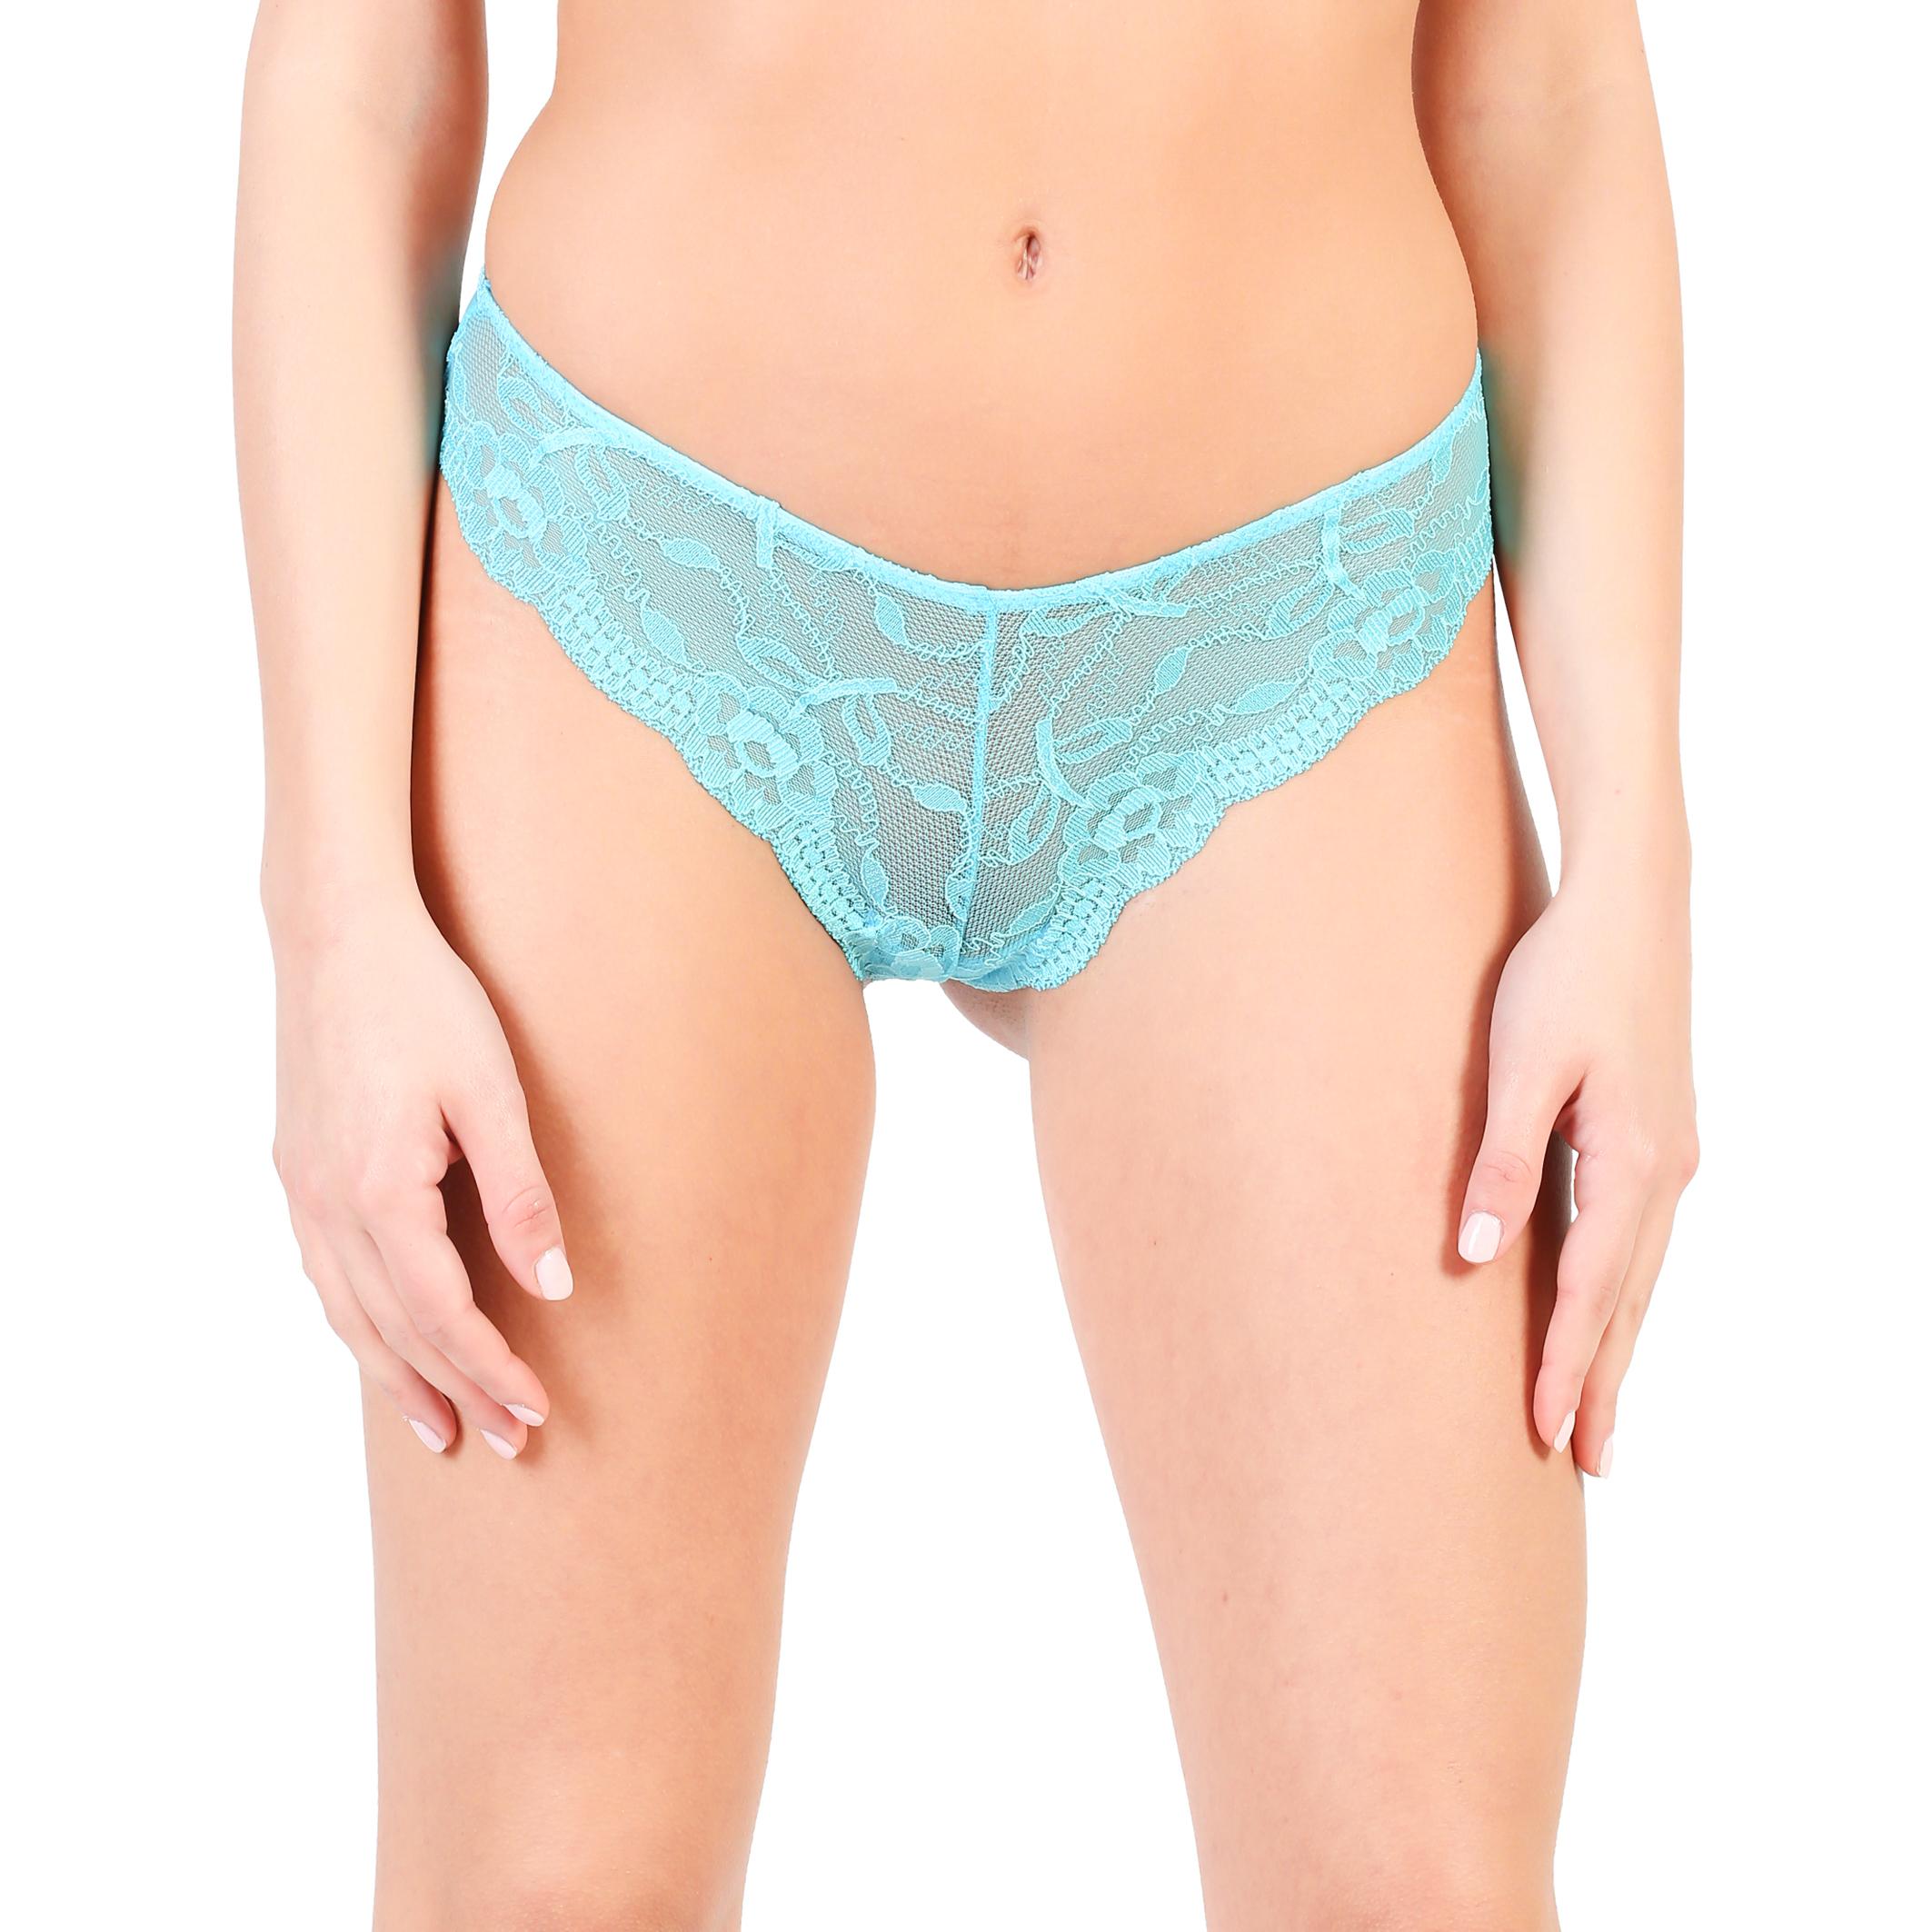 Pierre Cardin underwear PCW_LAIZE Donna Blu 87847